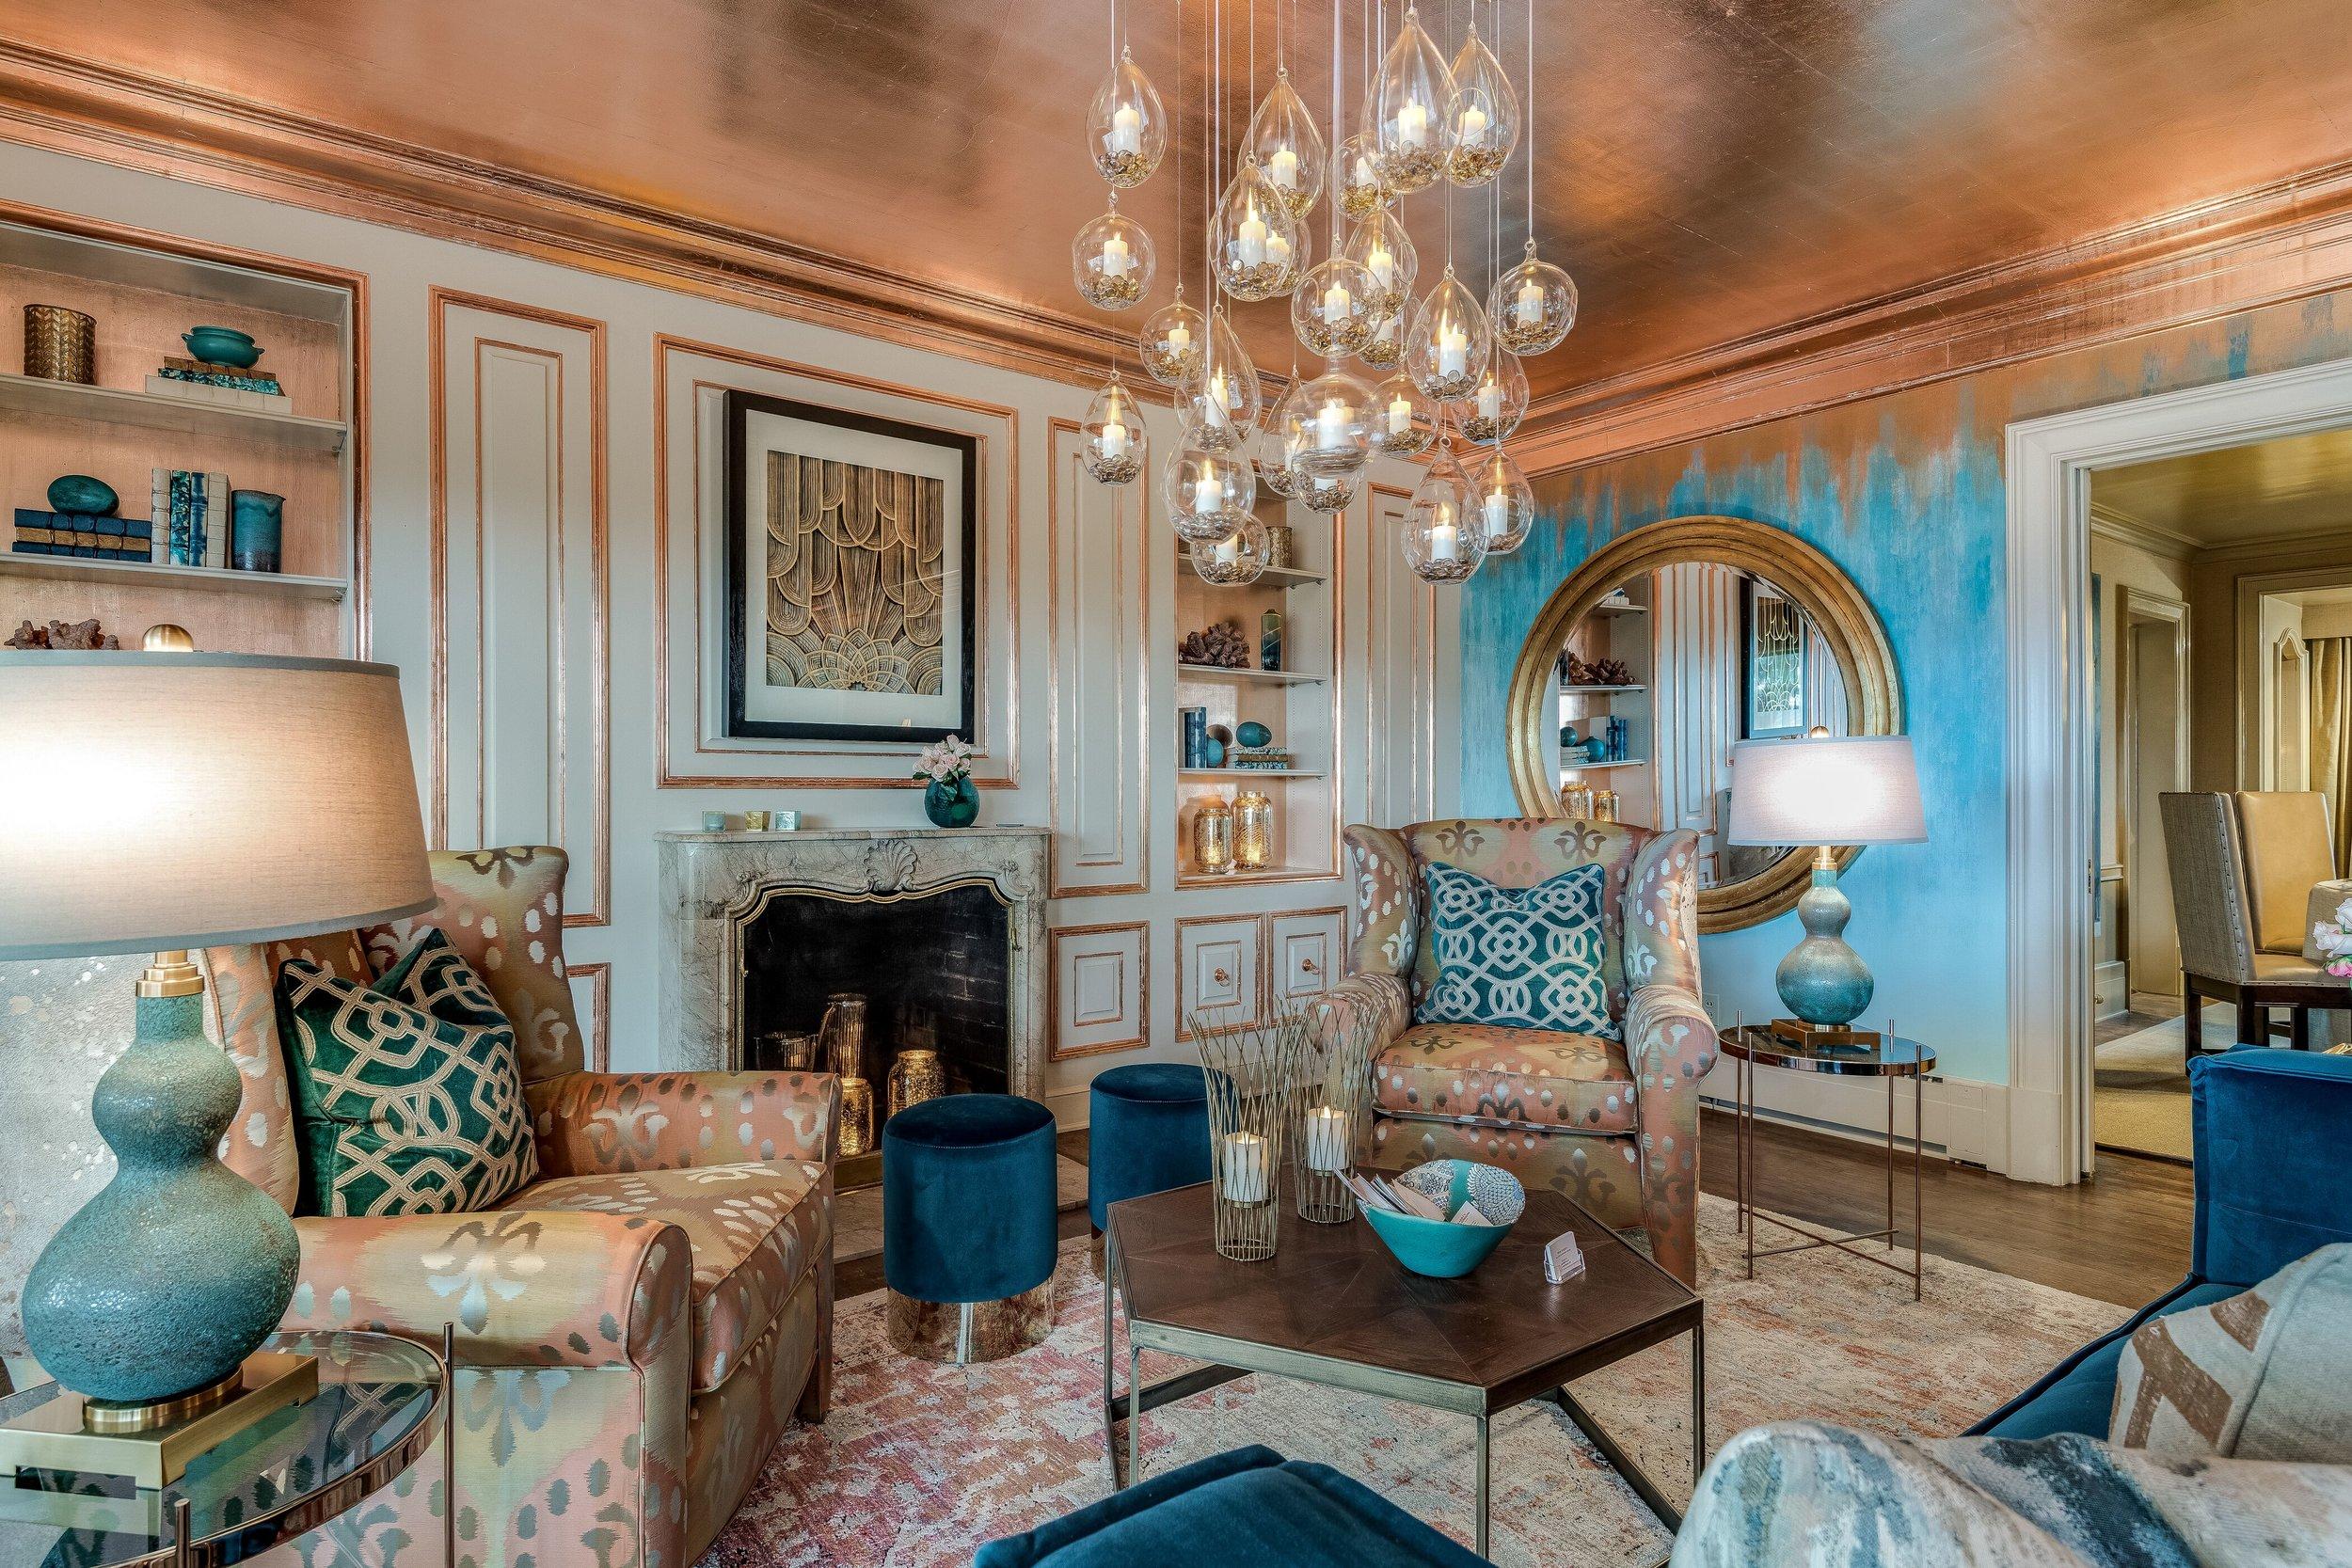 marty living room -2 LN.jpeg